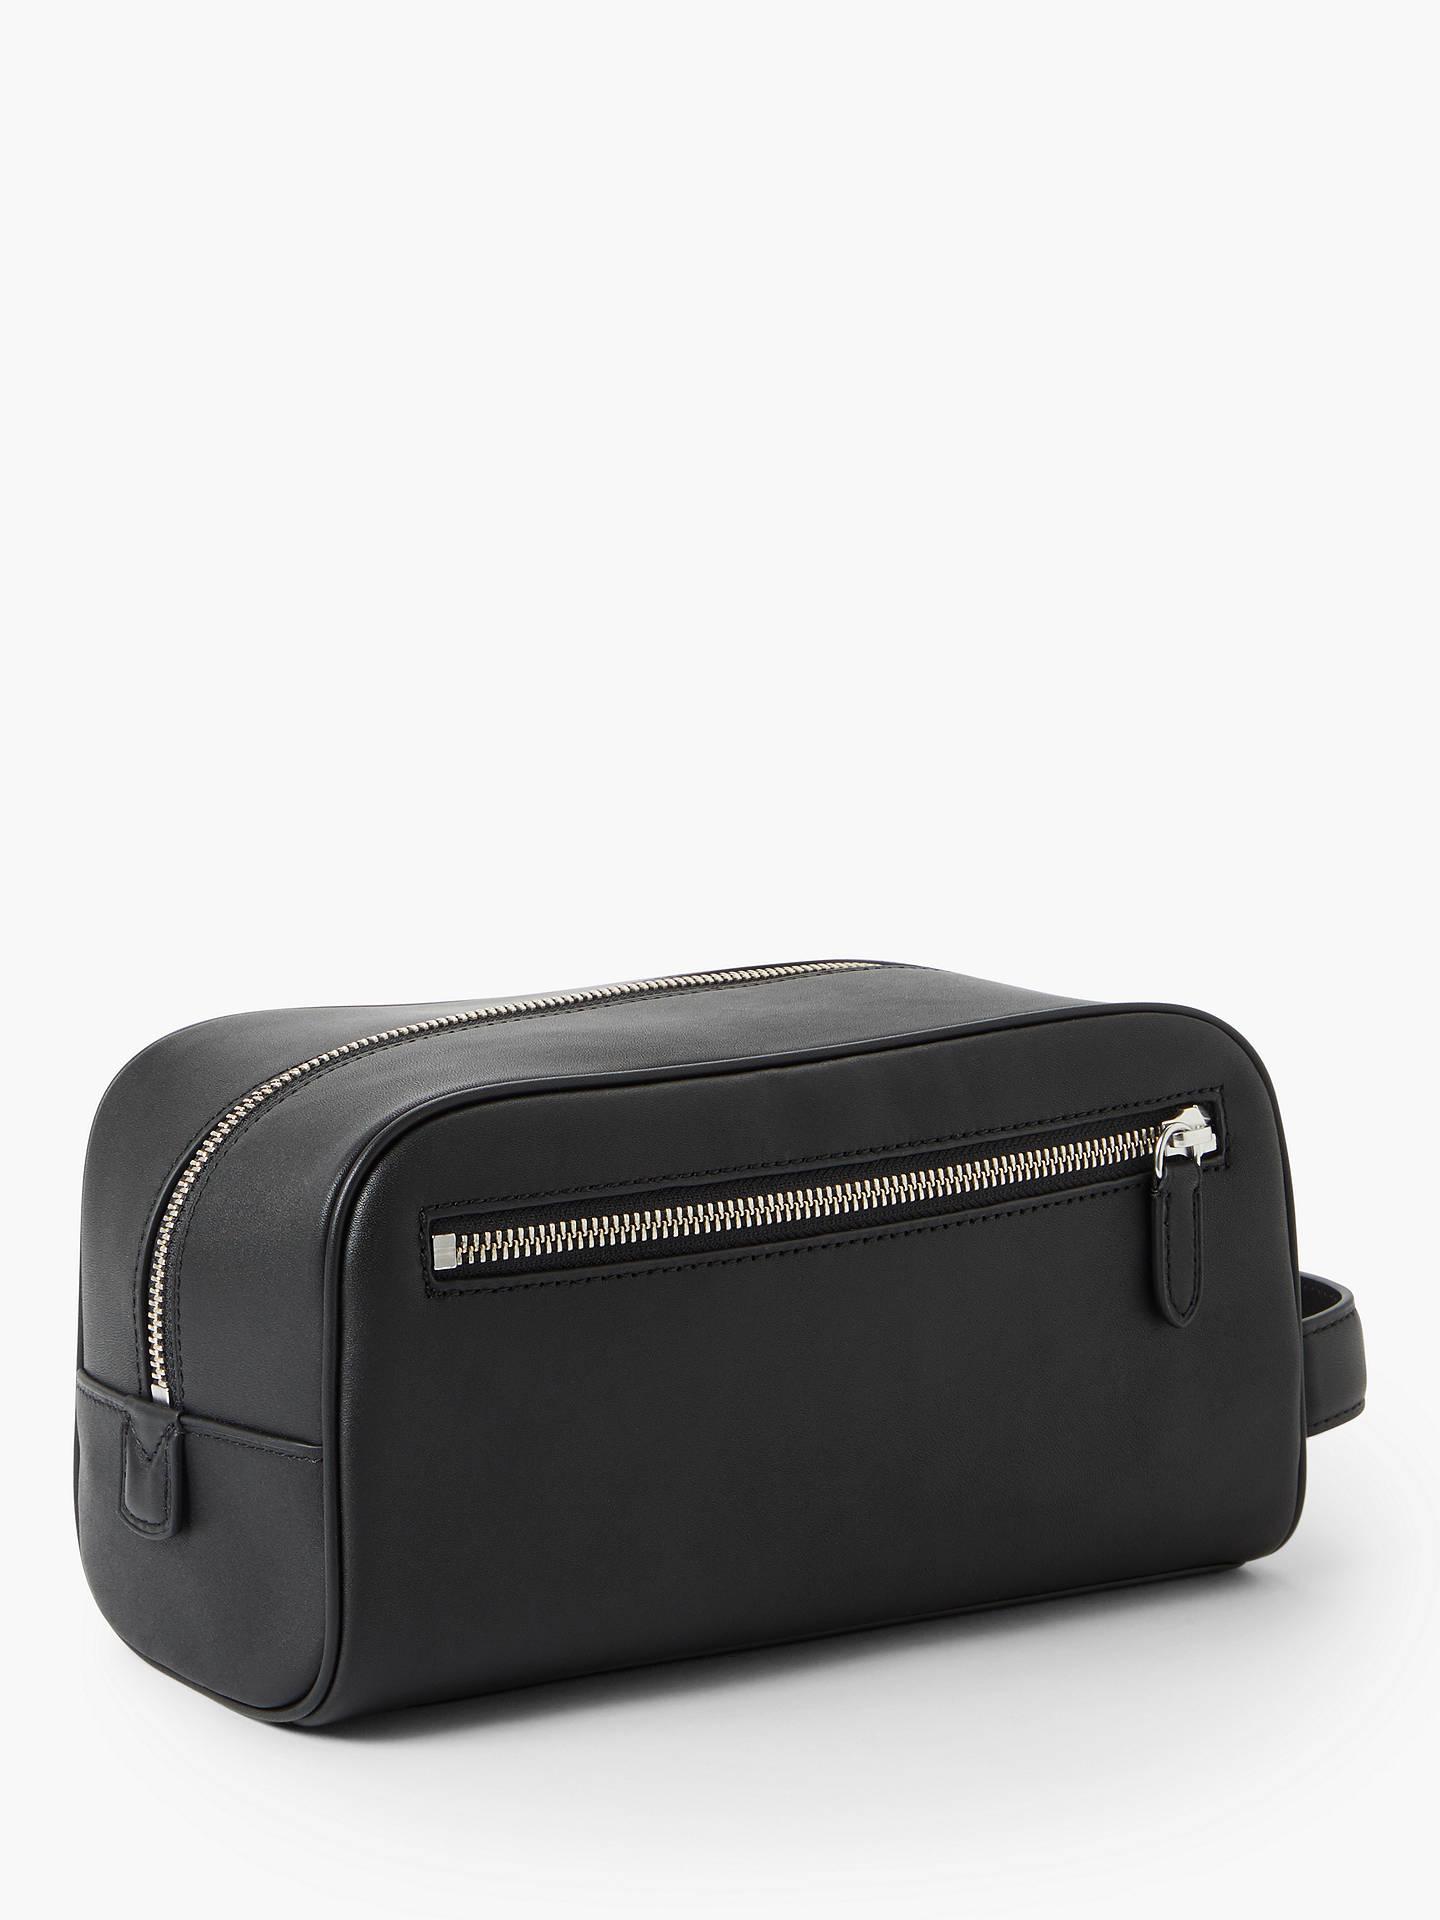 ... Buy Polo Ralph Lauren Leather Wash Bag 0665266513c84